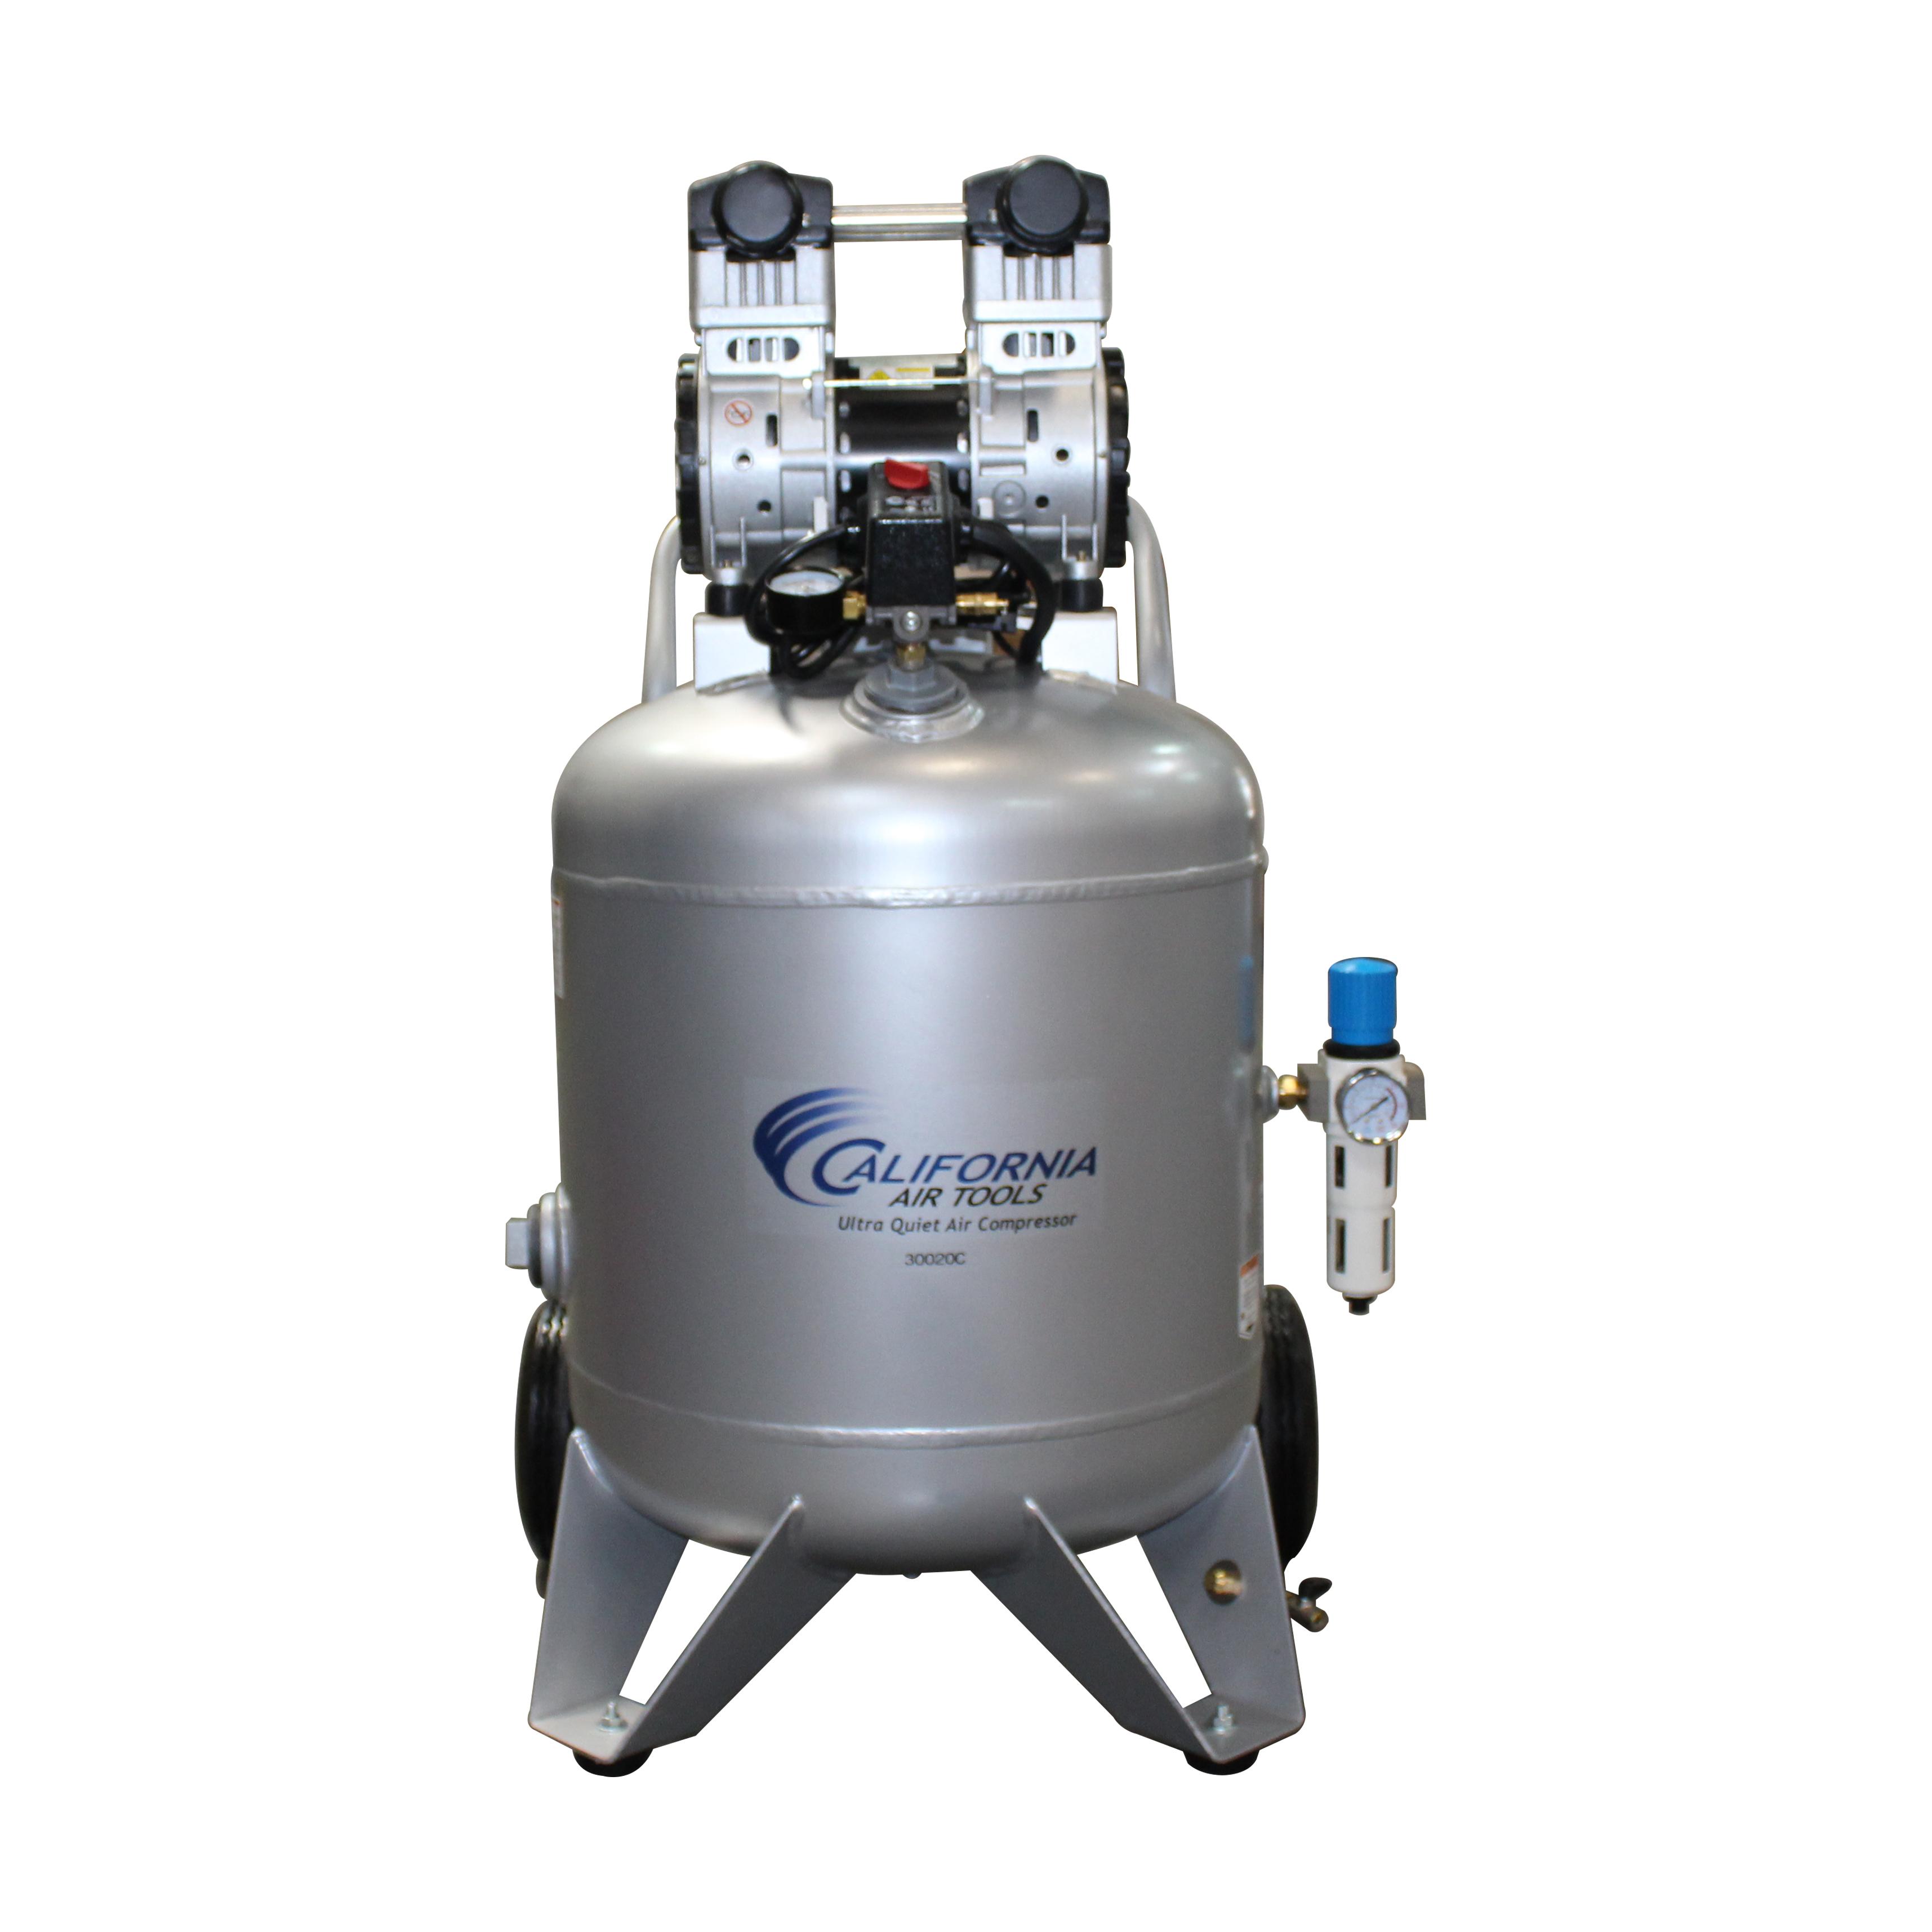 California Air Tools 30020C Ultra Quiet  & Oil-Free  2.0 Hp, 30.0 Gal. Steel Tank Air Compressor